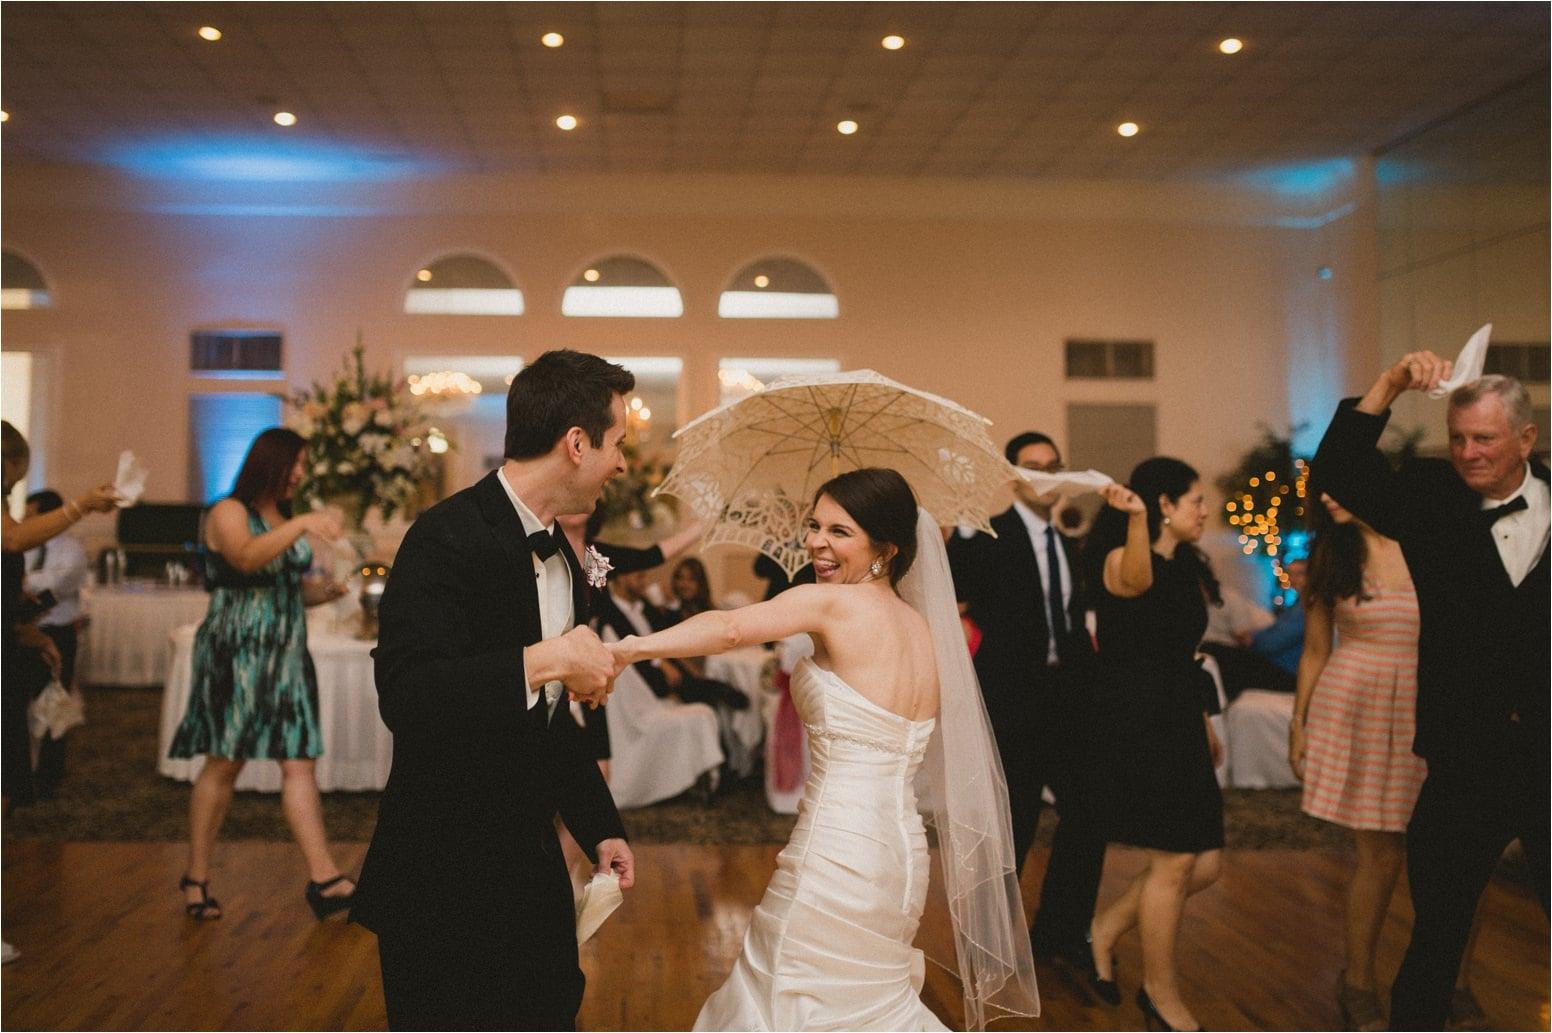 New Orleans Wedding Photographers - Dark Roux Photography 60